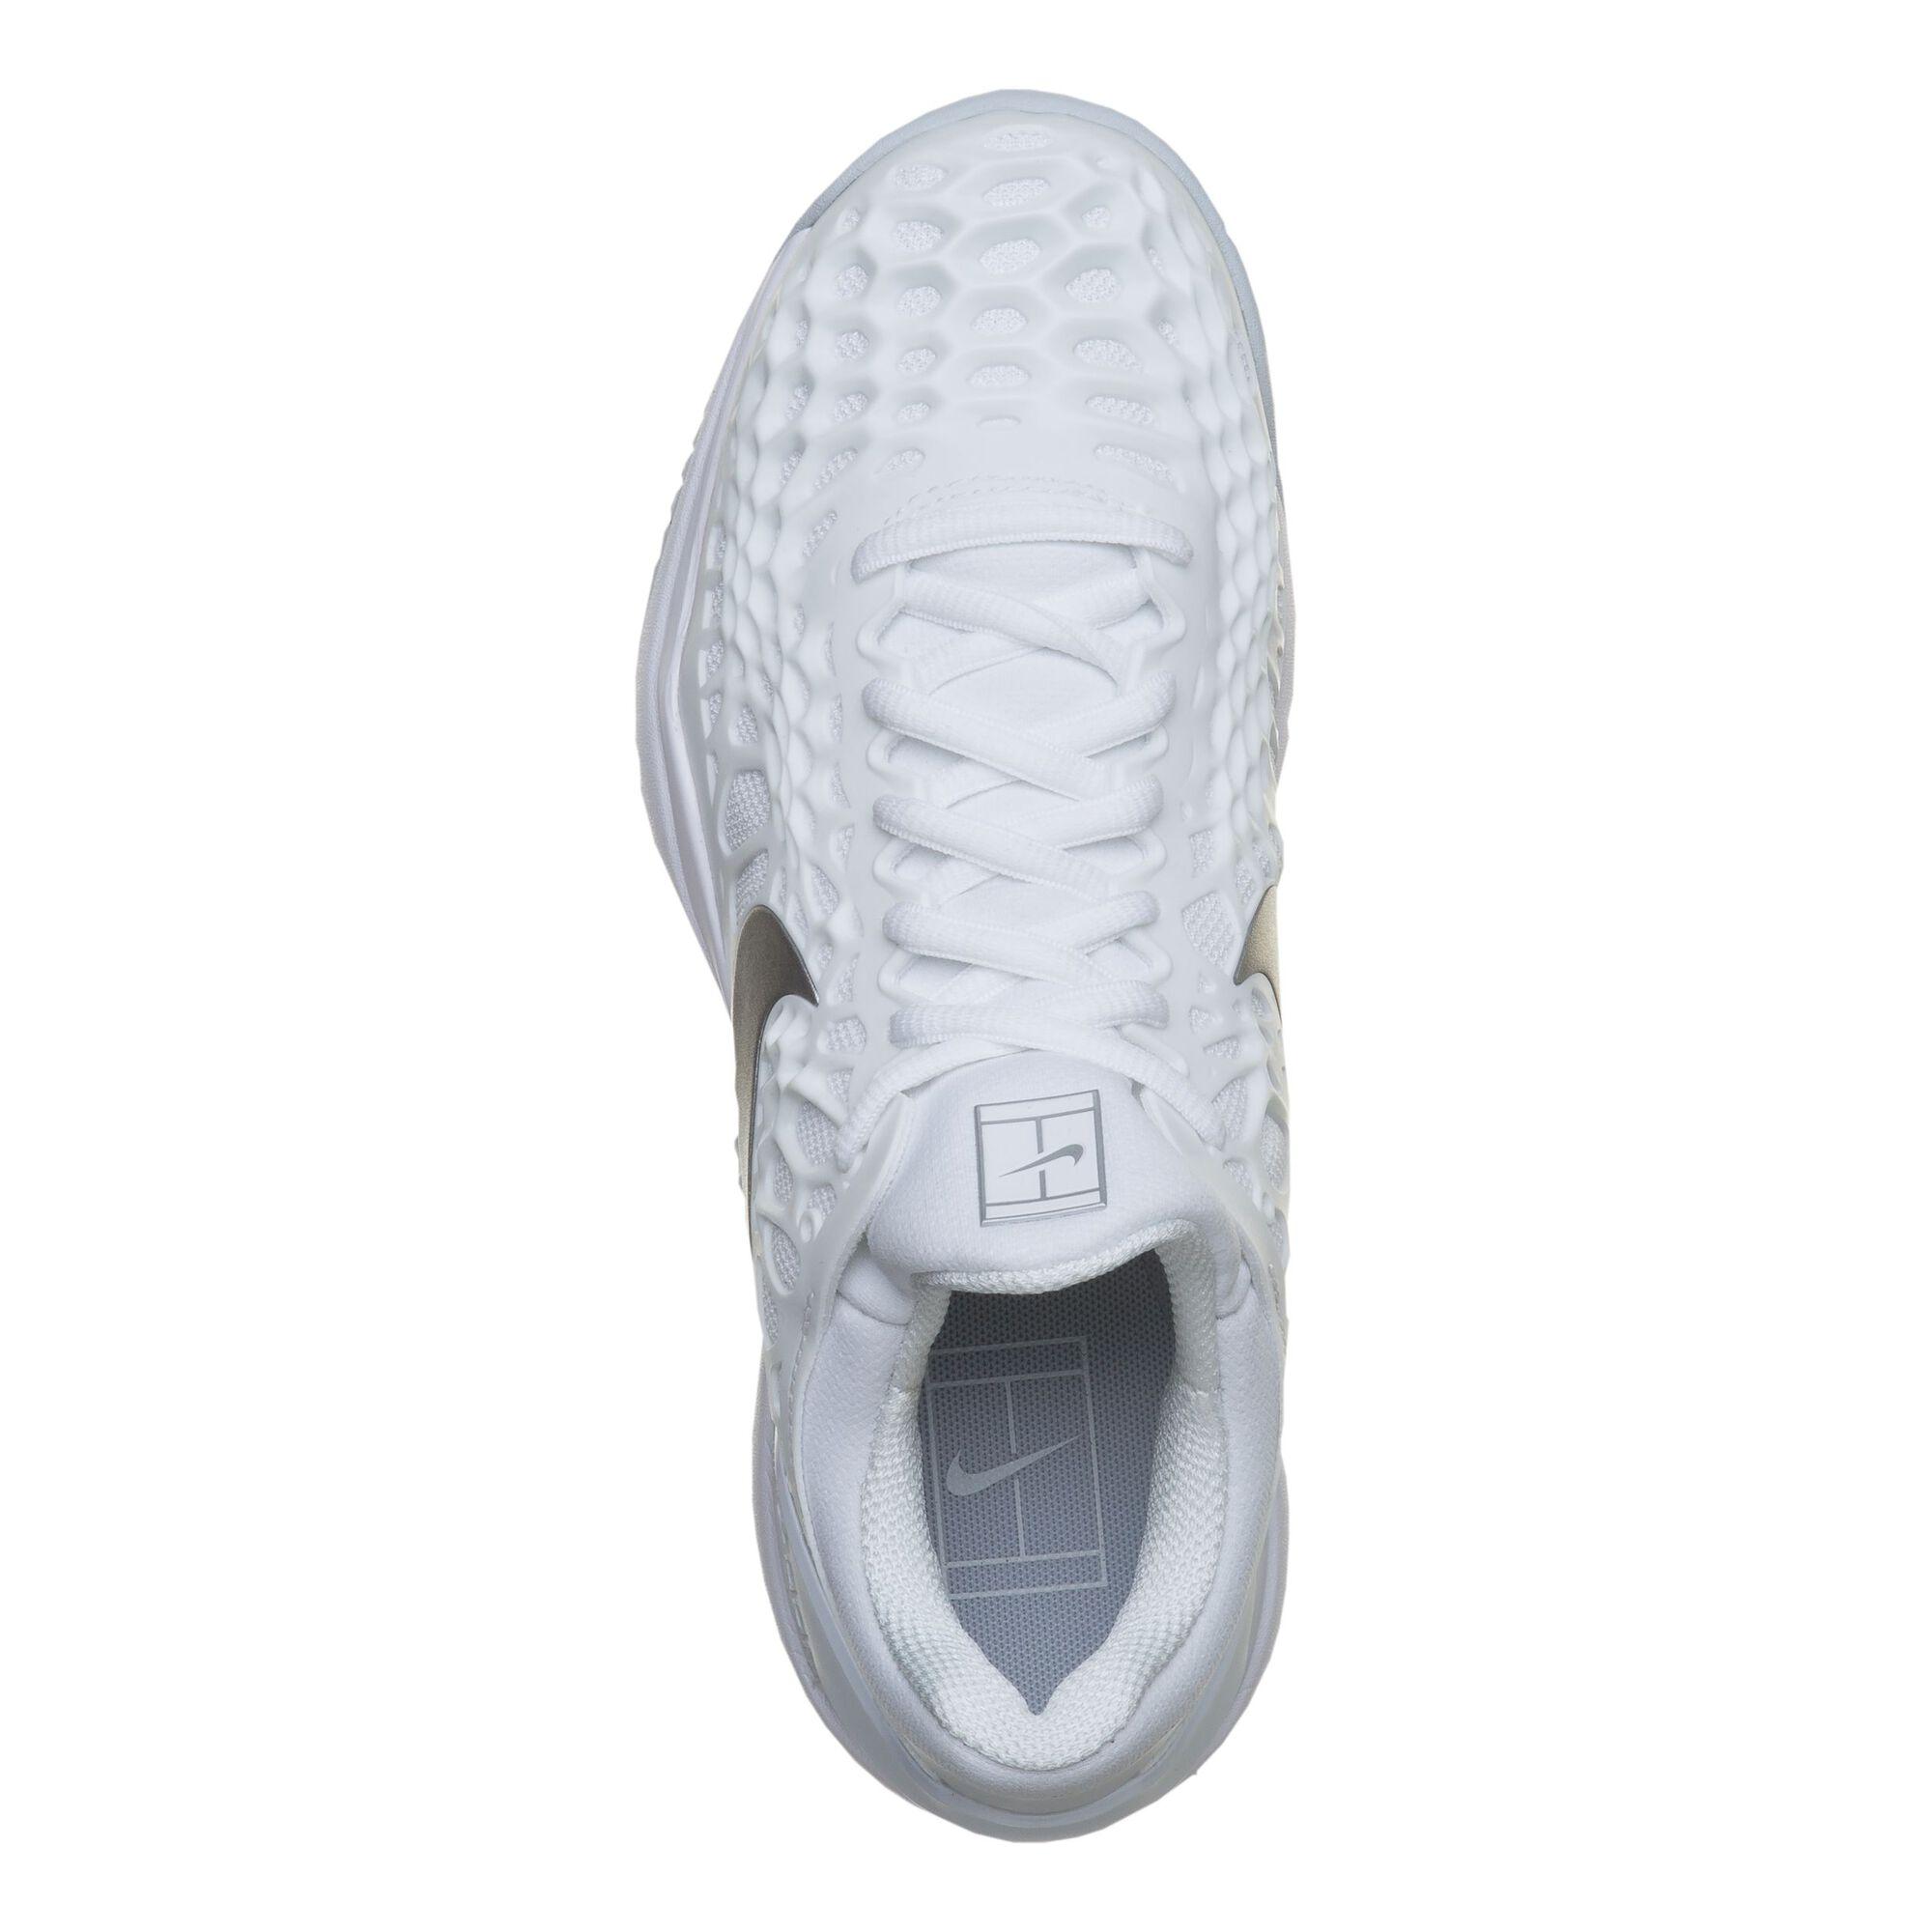 quality design 6af83 24a36 ... Nike · Nike · Nike · Nike · Nike. Zoom Cage 3 ...